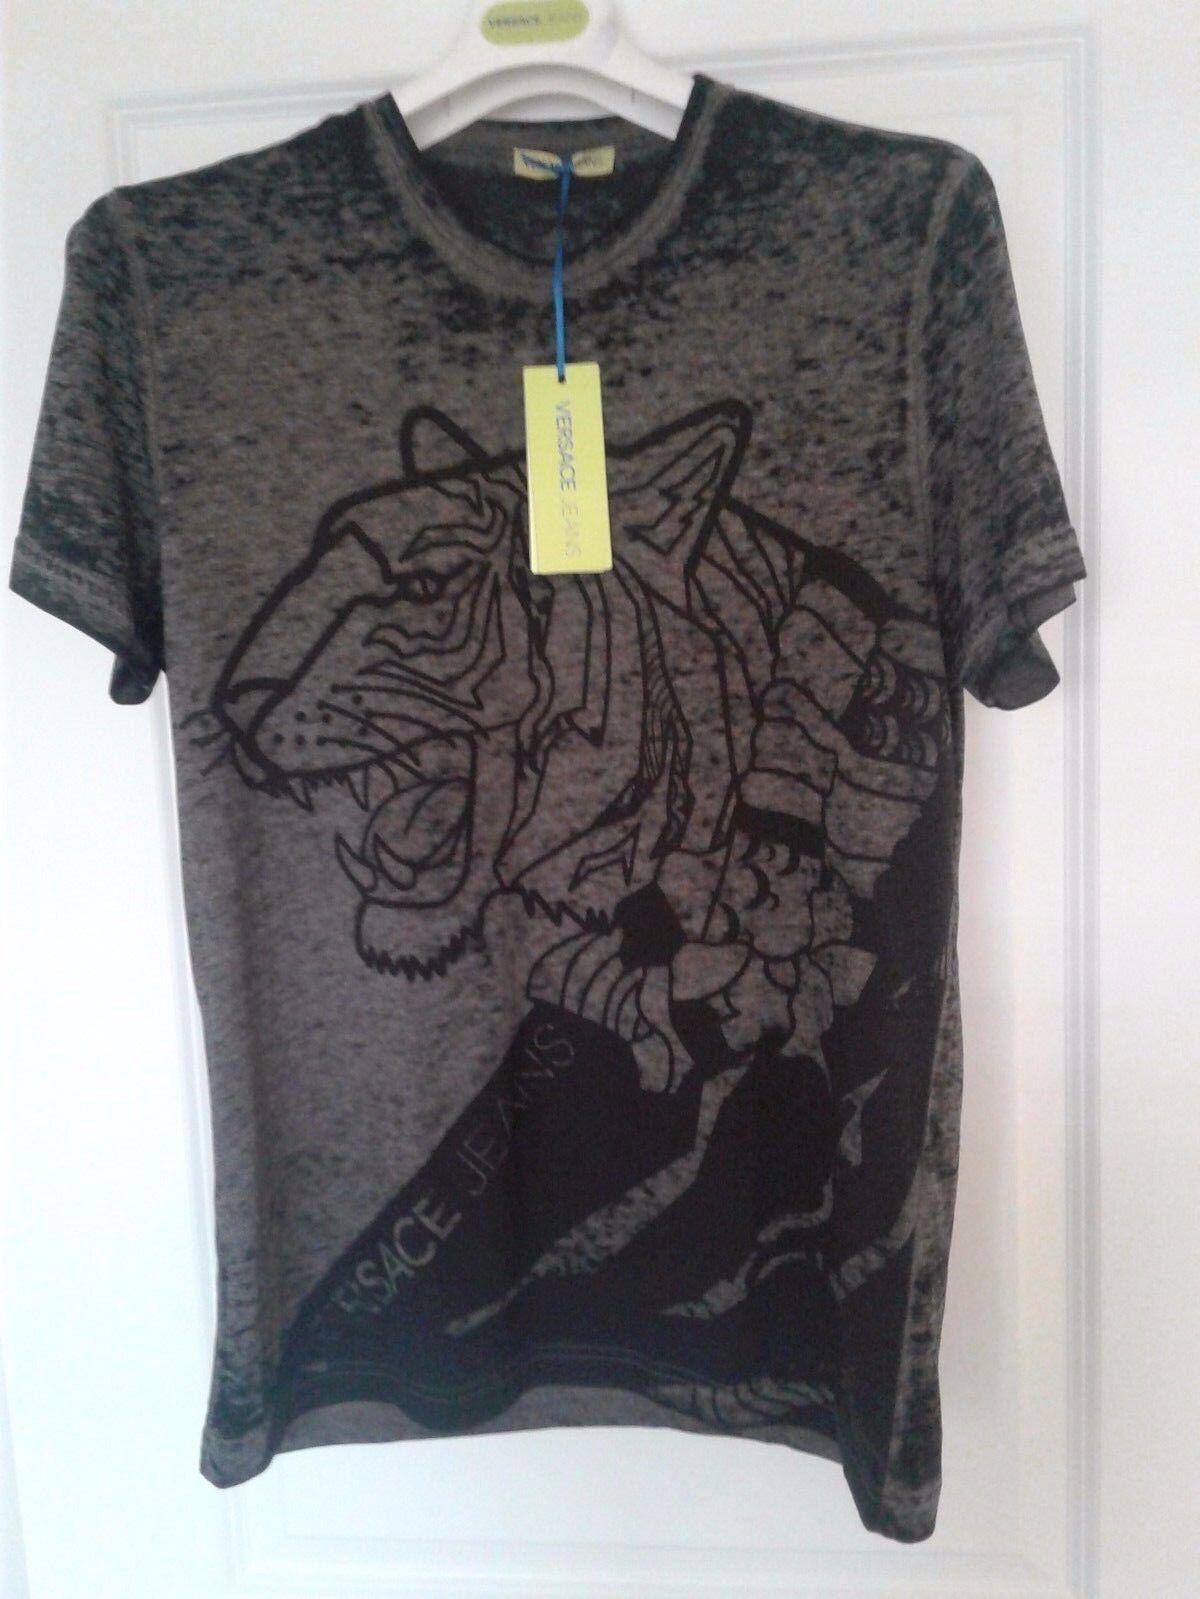 Authentic, brand new, tiger print,Versace Jeans Tshirt Größe M